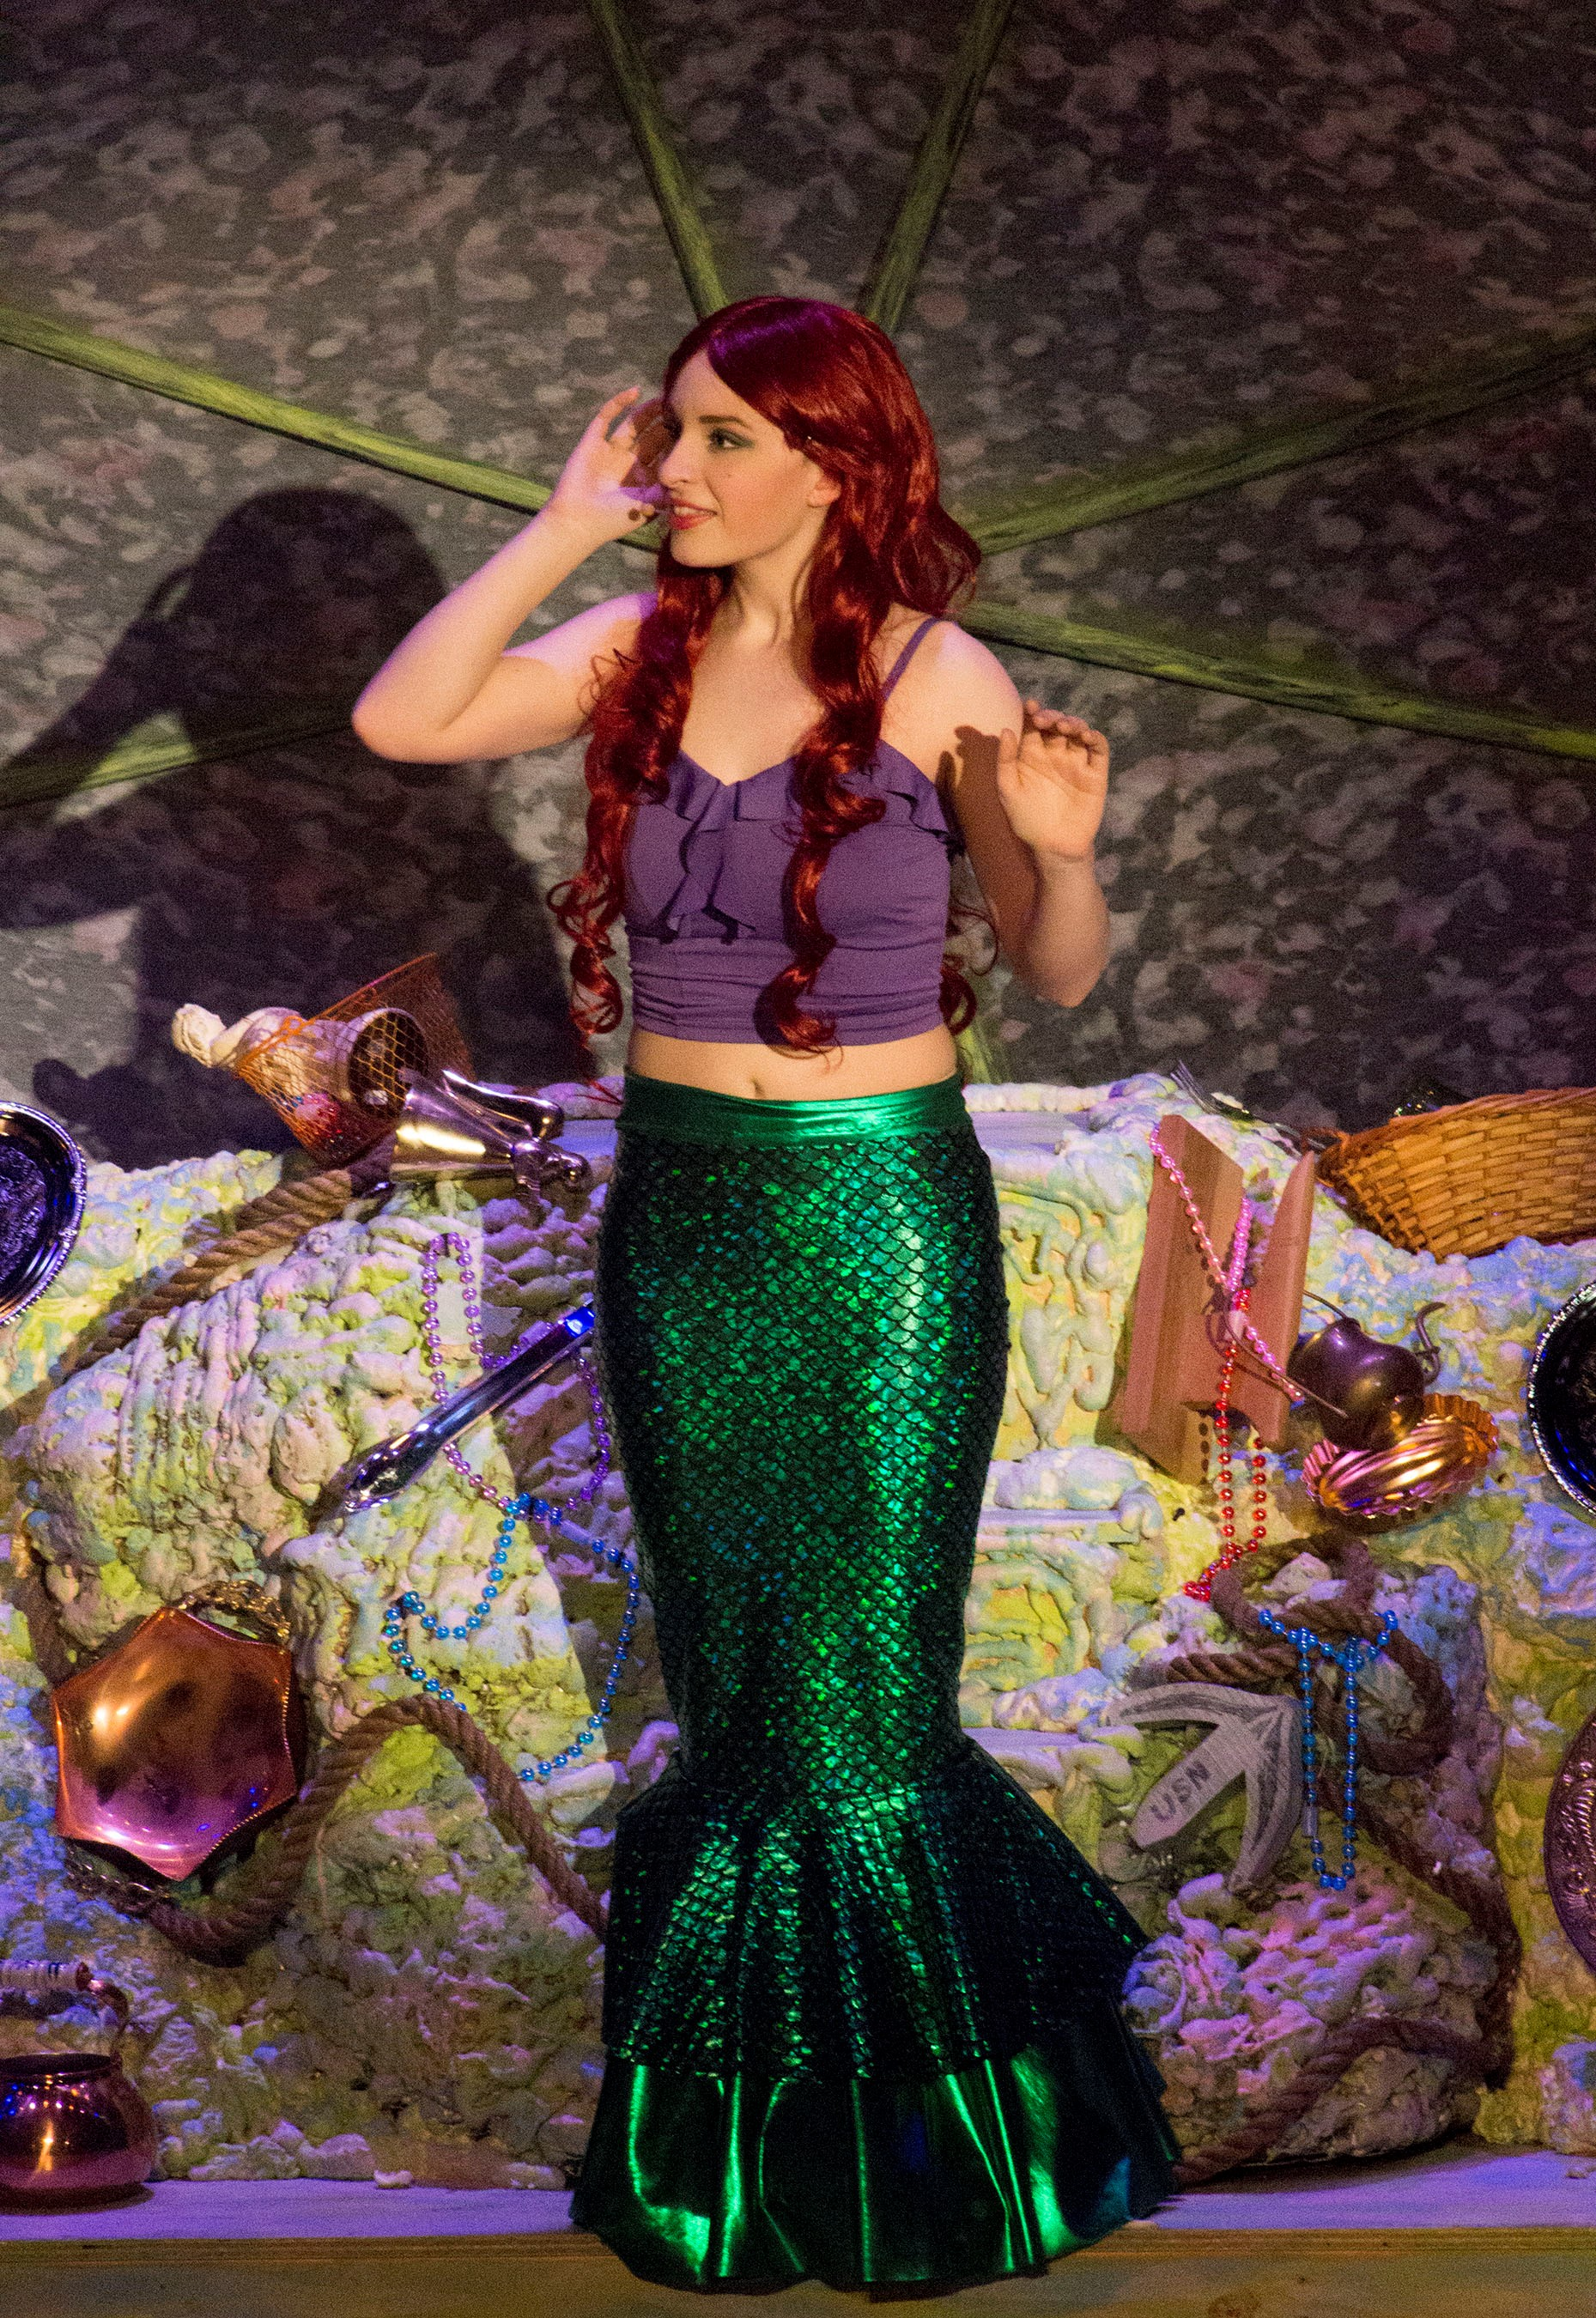 The Little Mermaid - 2016